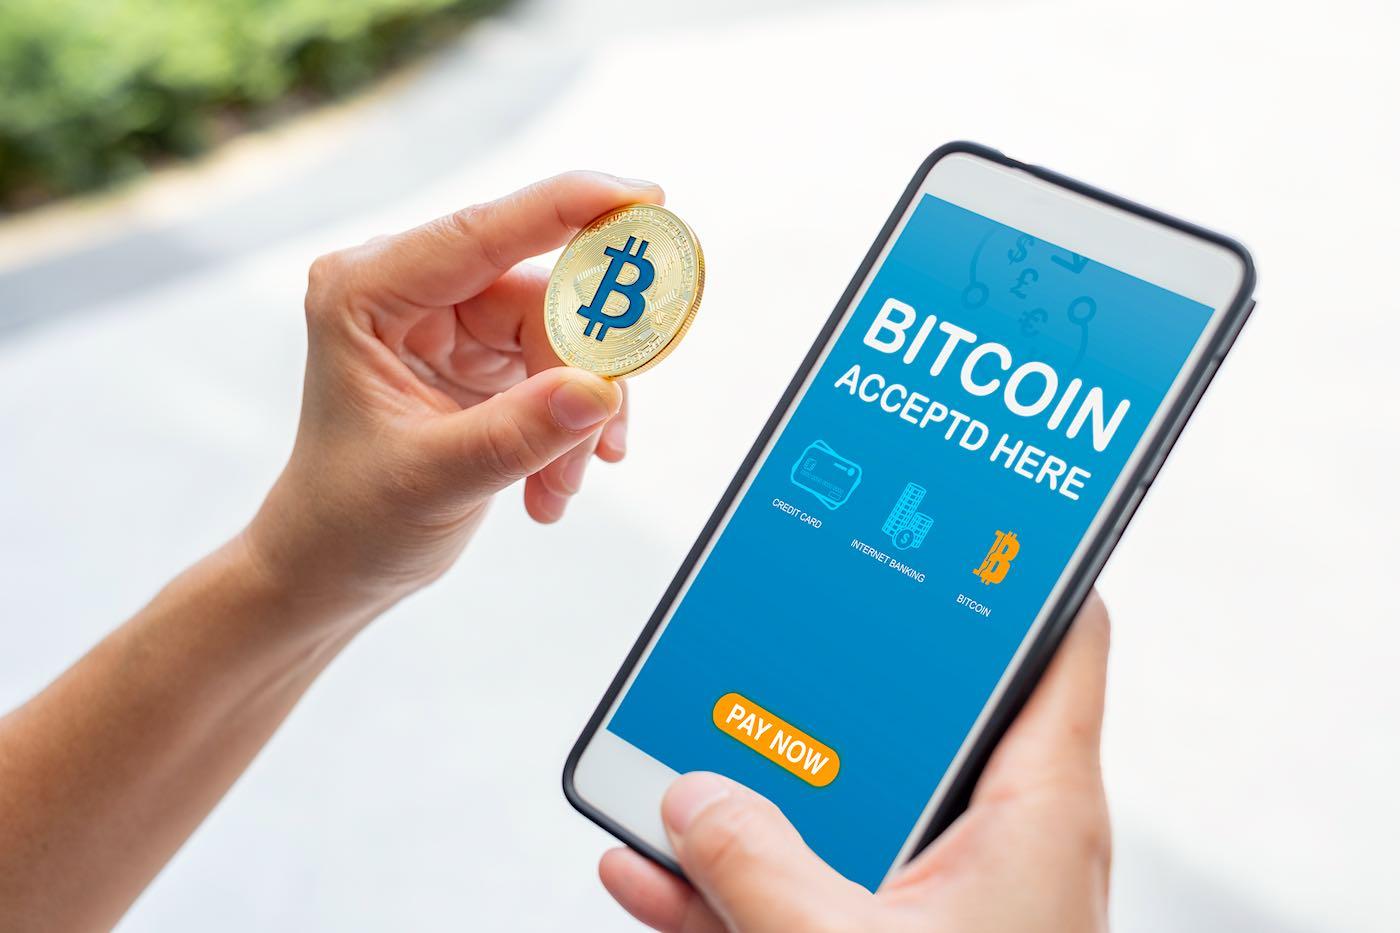 Apple Pay ahora admite pagos con Bitcoin por primera vez